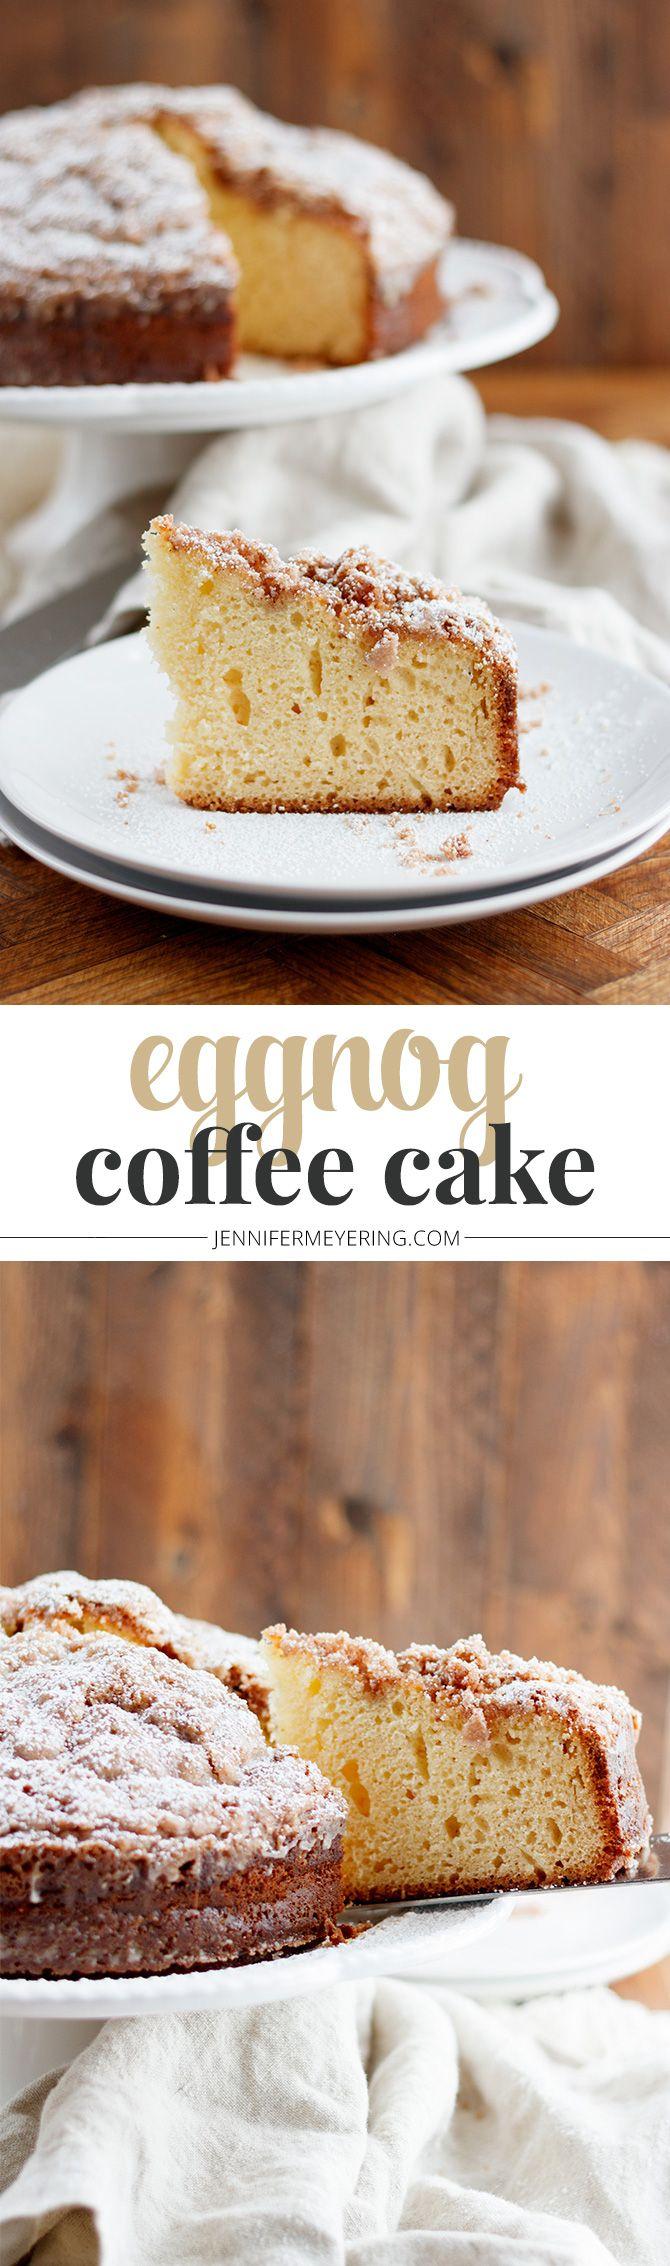 Eggnog Coffee Cake - JenniferMeyering.com